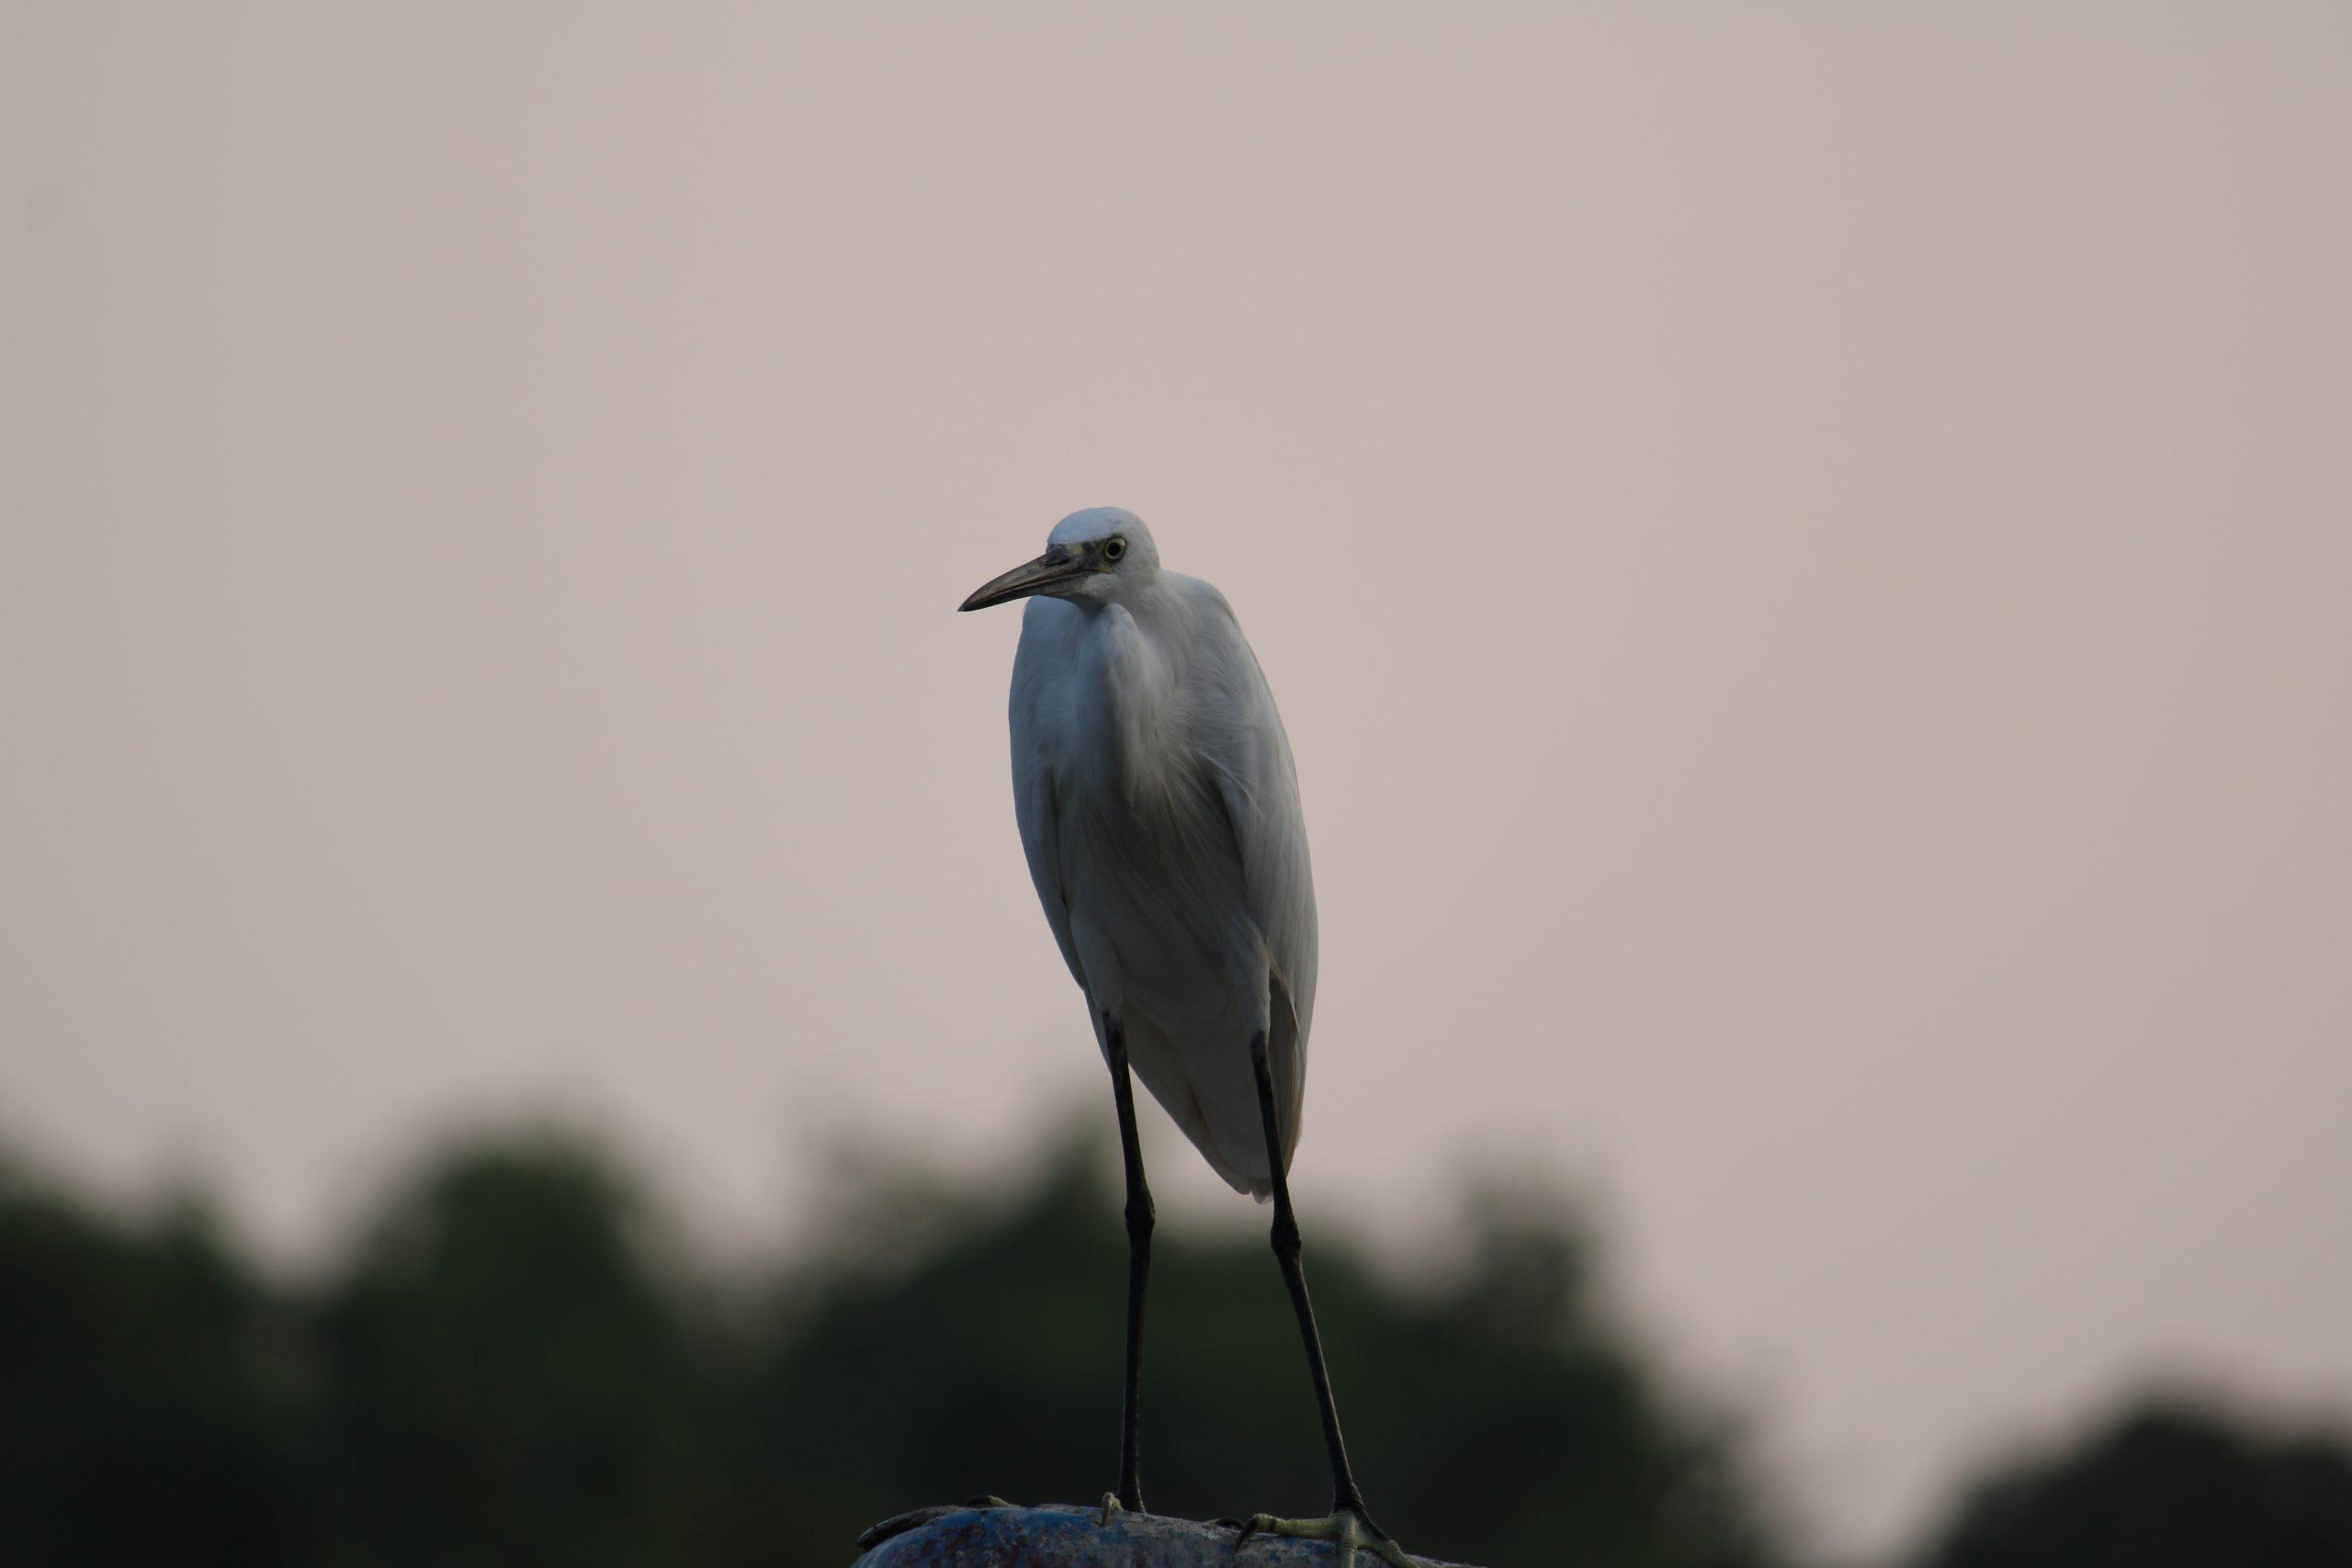 A crane bird sitting on the rock